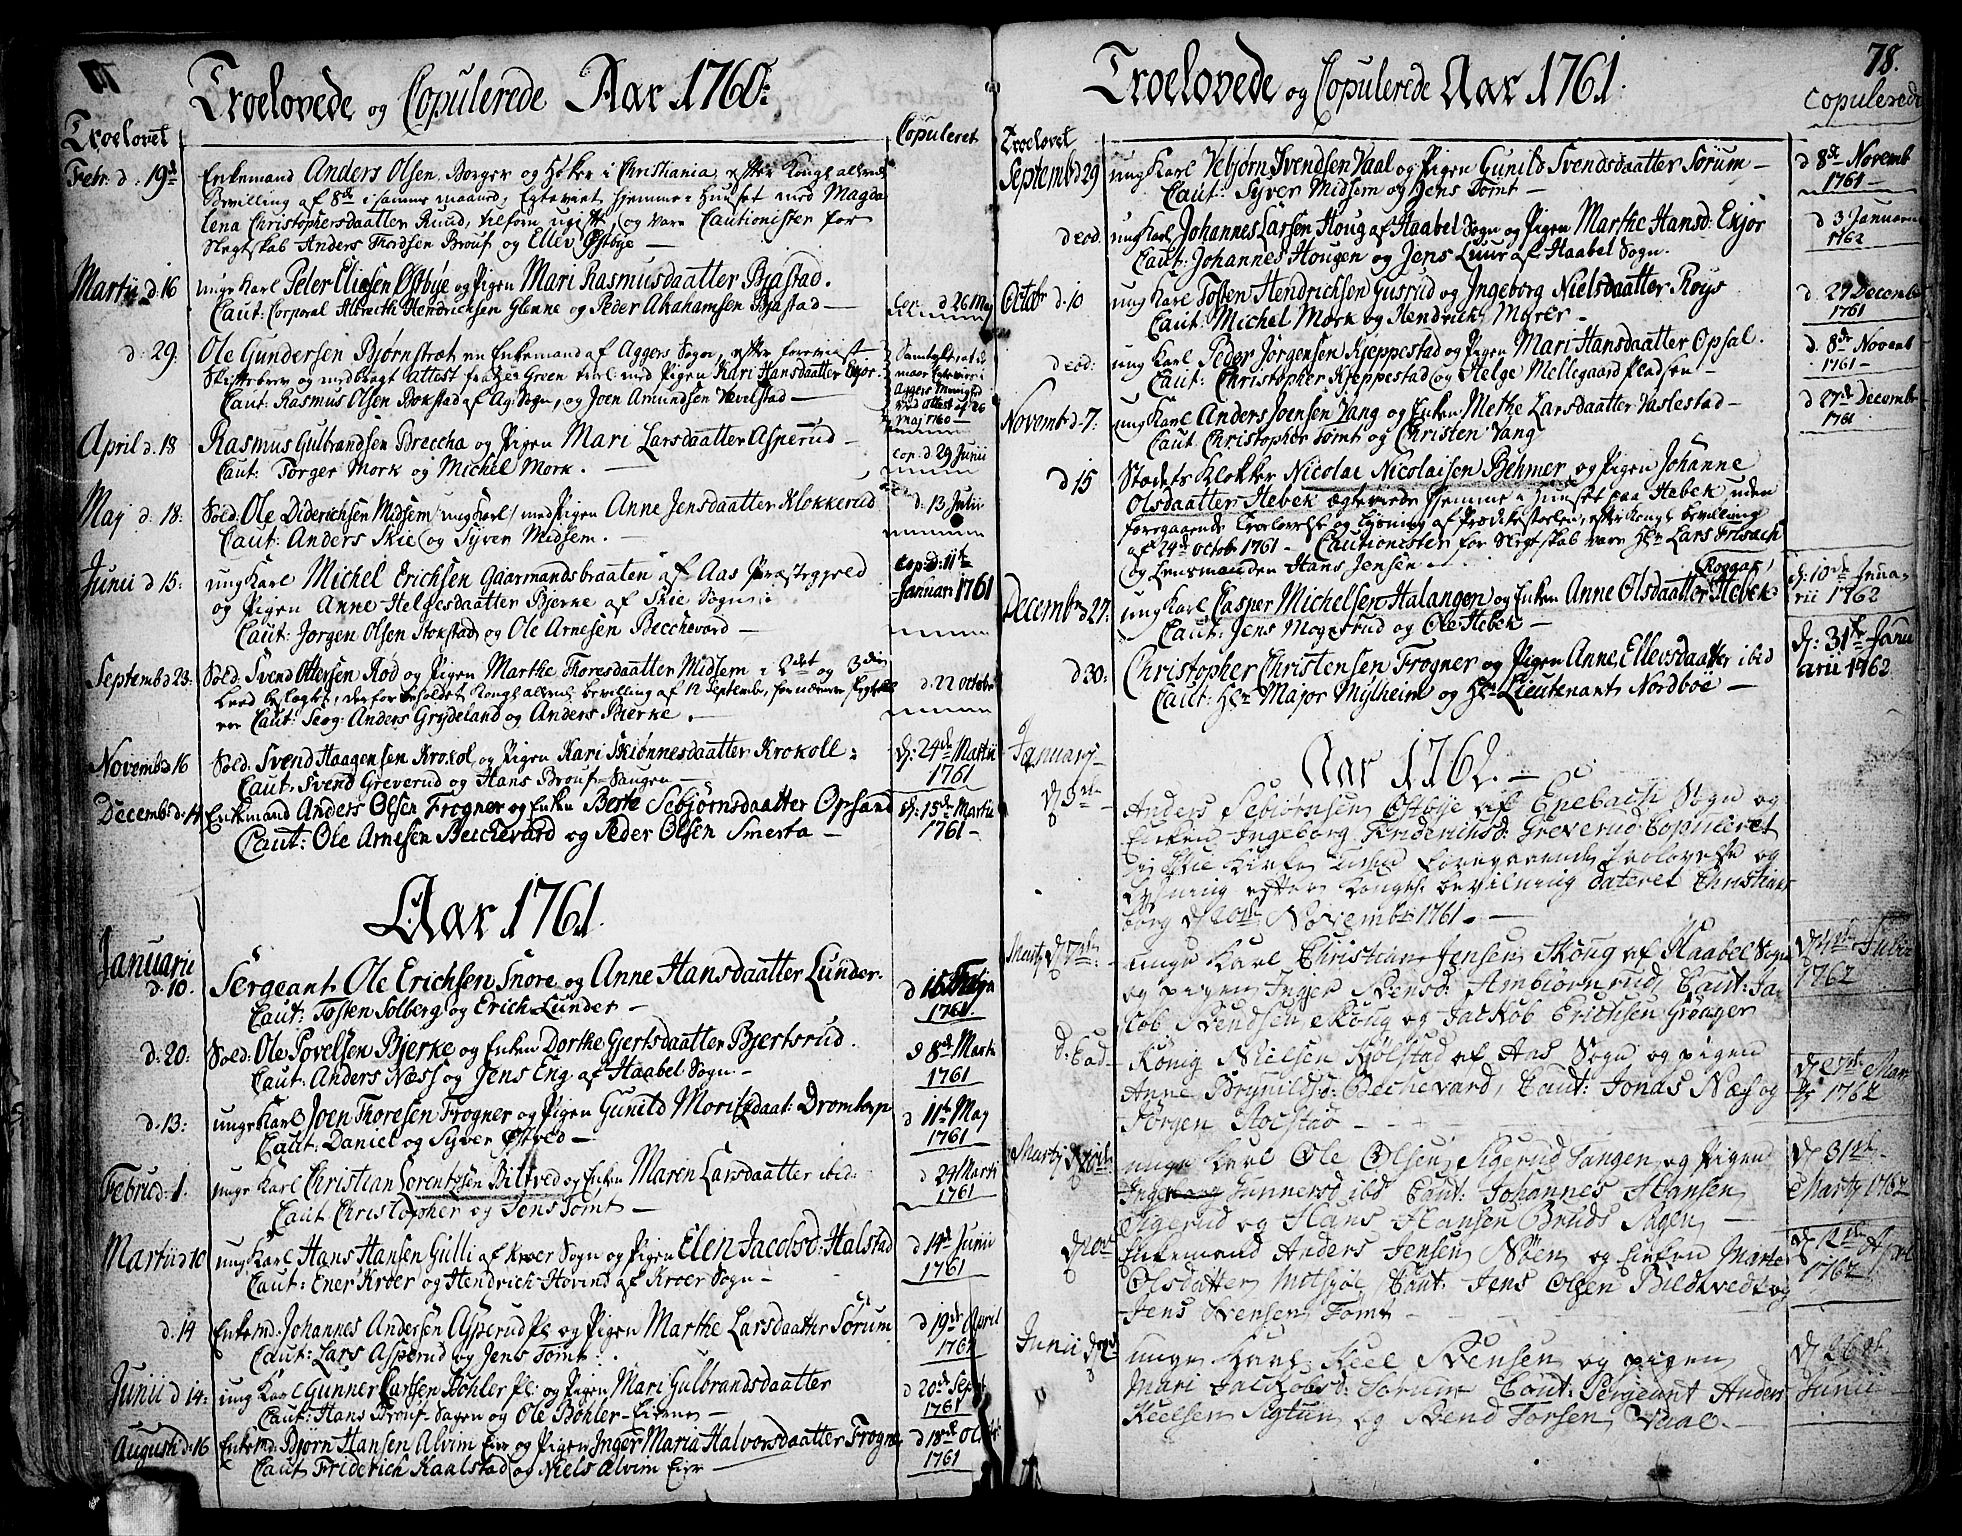 SAO, Kråkstad prestekontor Kirkebøker, F/Fa/L0001: Ministerialbok nr. I 1, 1736-1785, s. 78